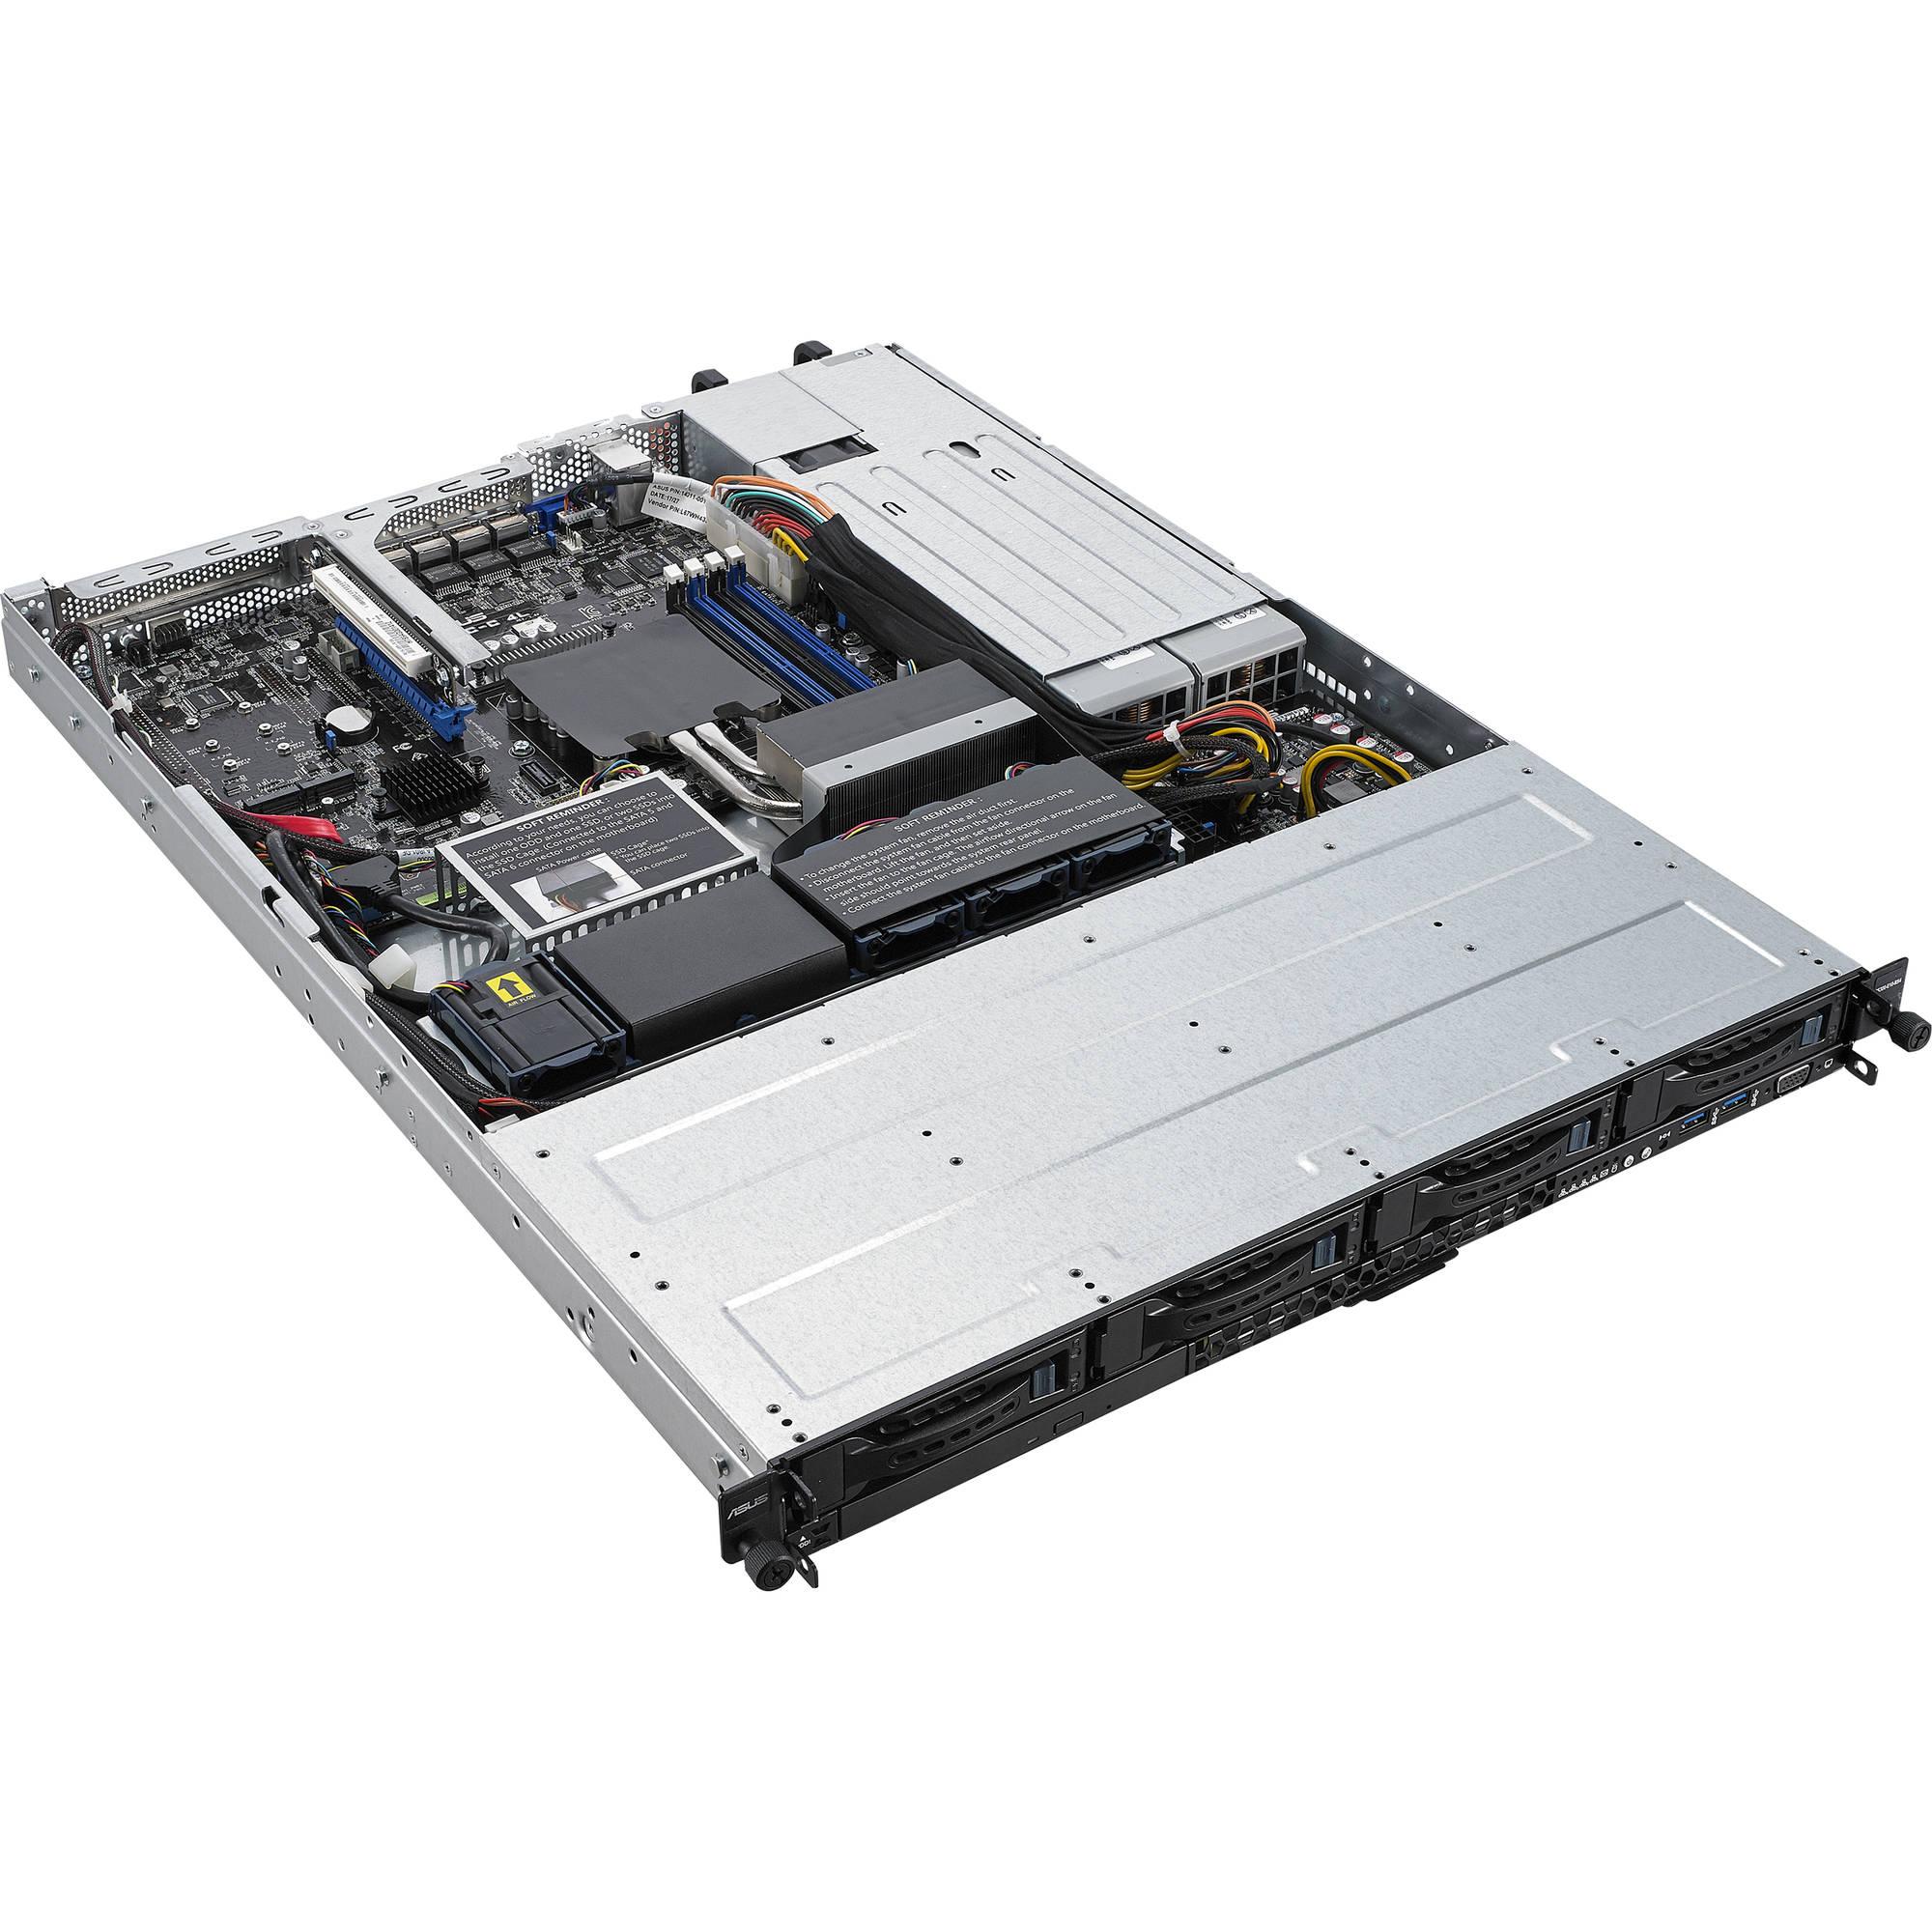 ASUS Intel Xeon E Rack-Optimized 1U Server